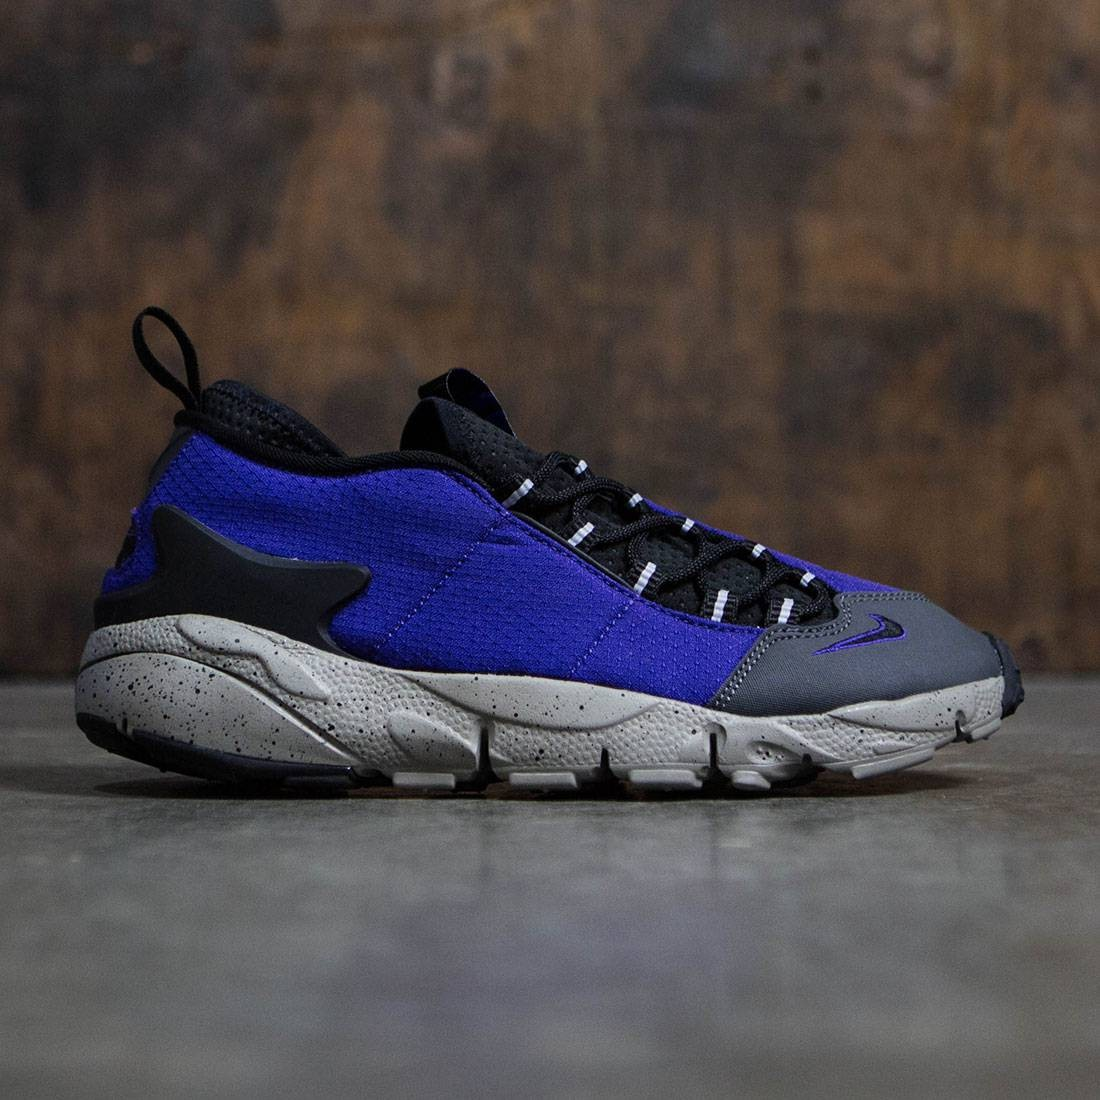 Nike Men Air Footscape Nm (court purple / black-light taupe)